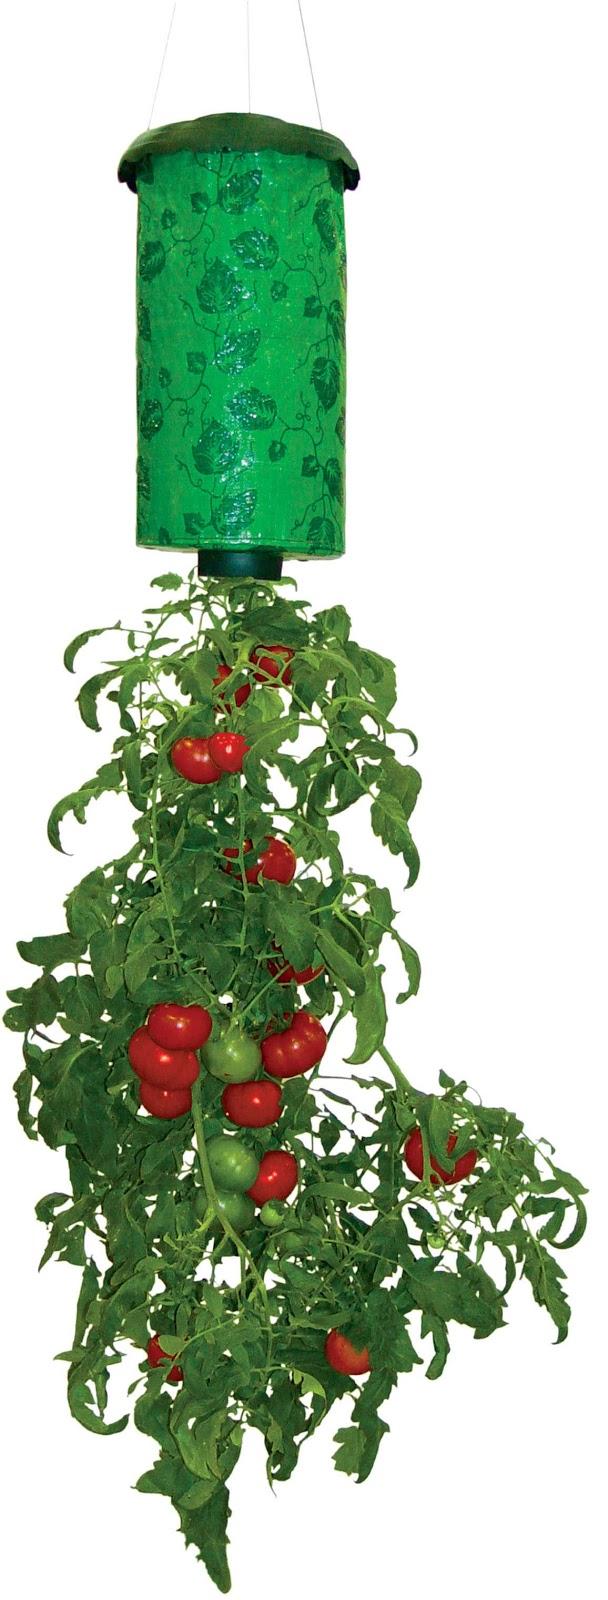 Upside Down Tomato Plants